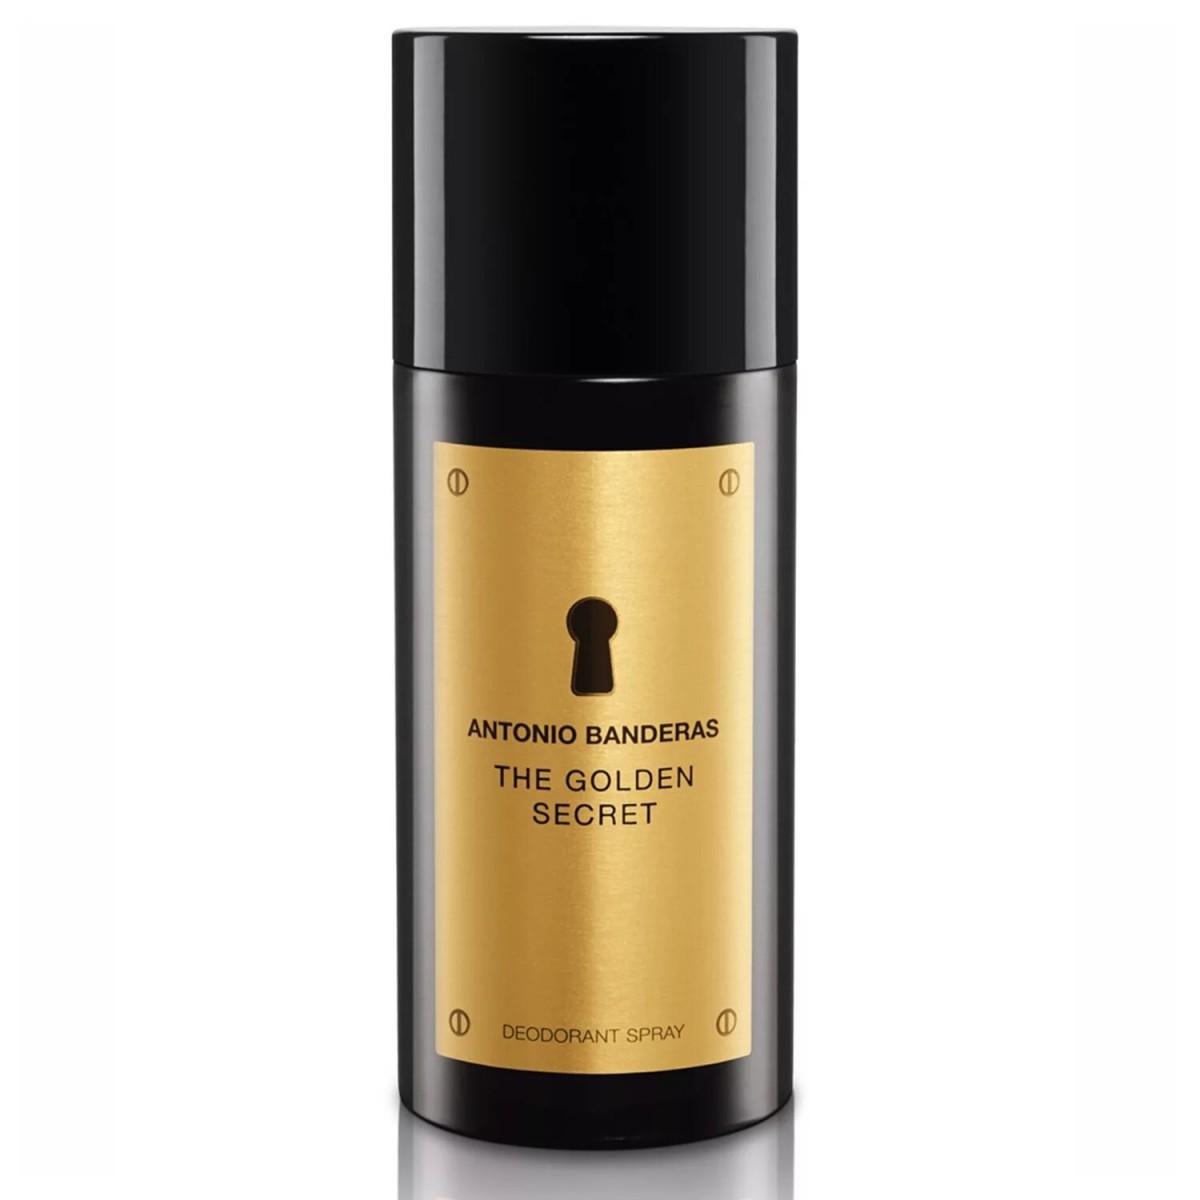 The Golden Secret Deodorant Spray